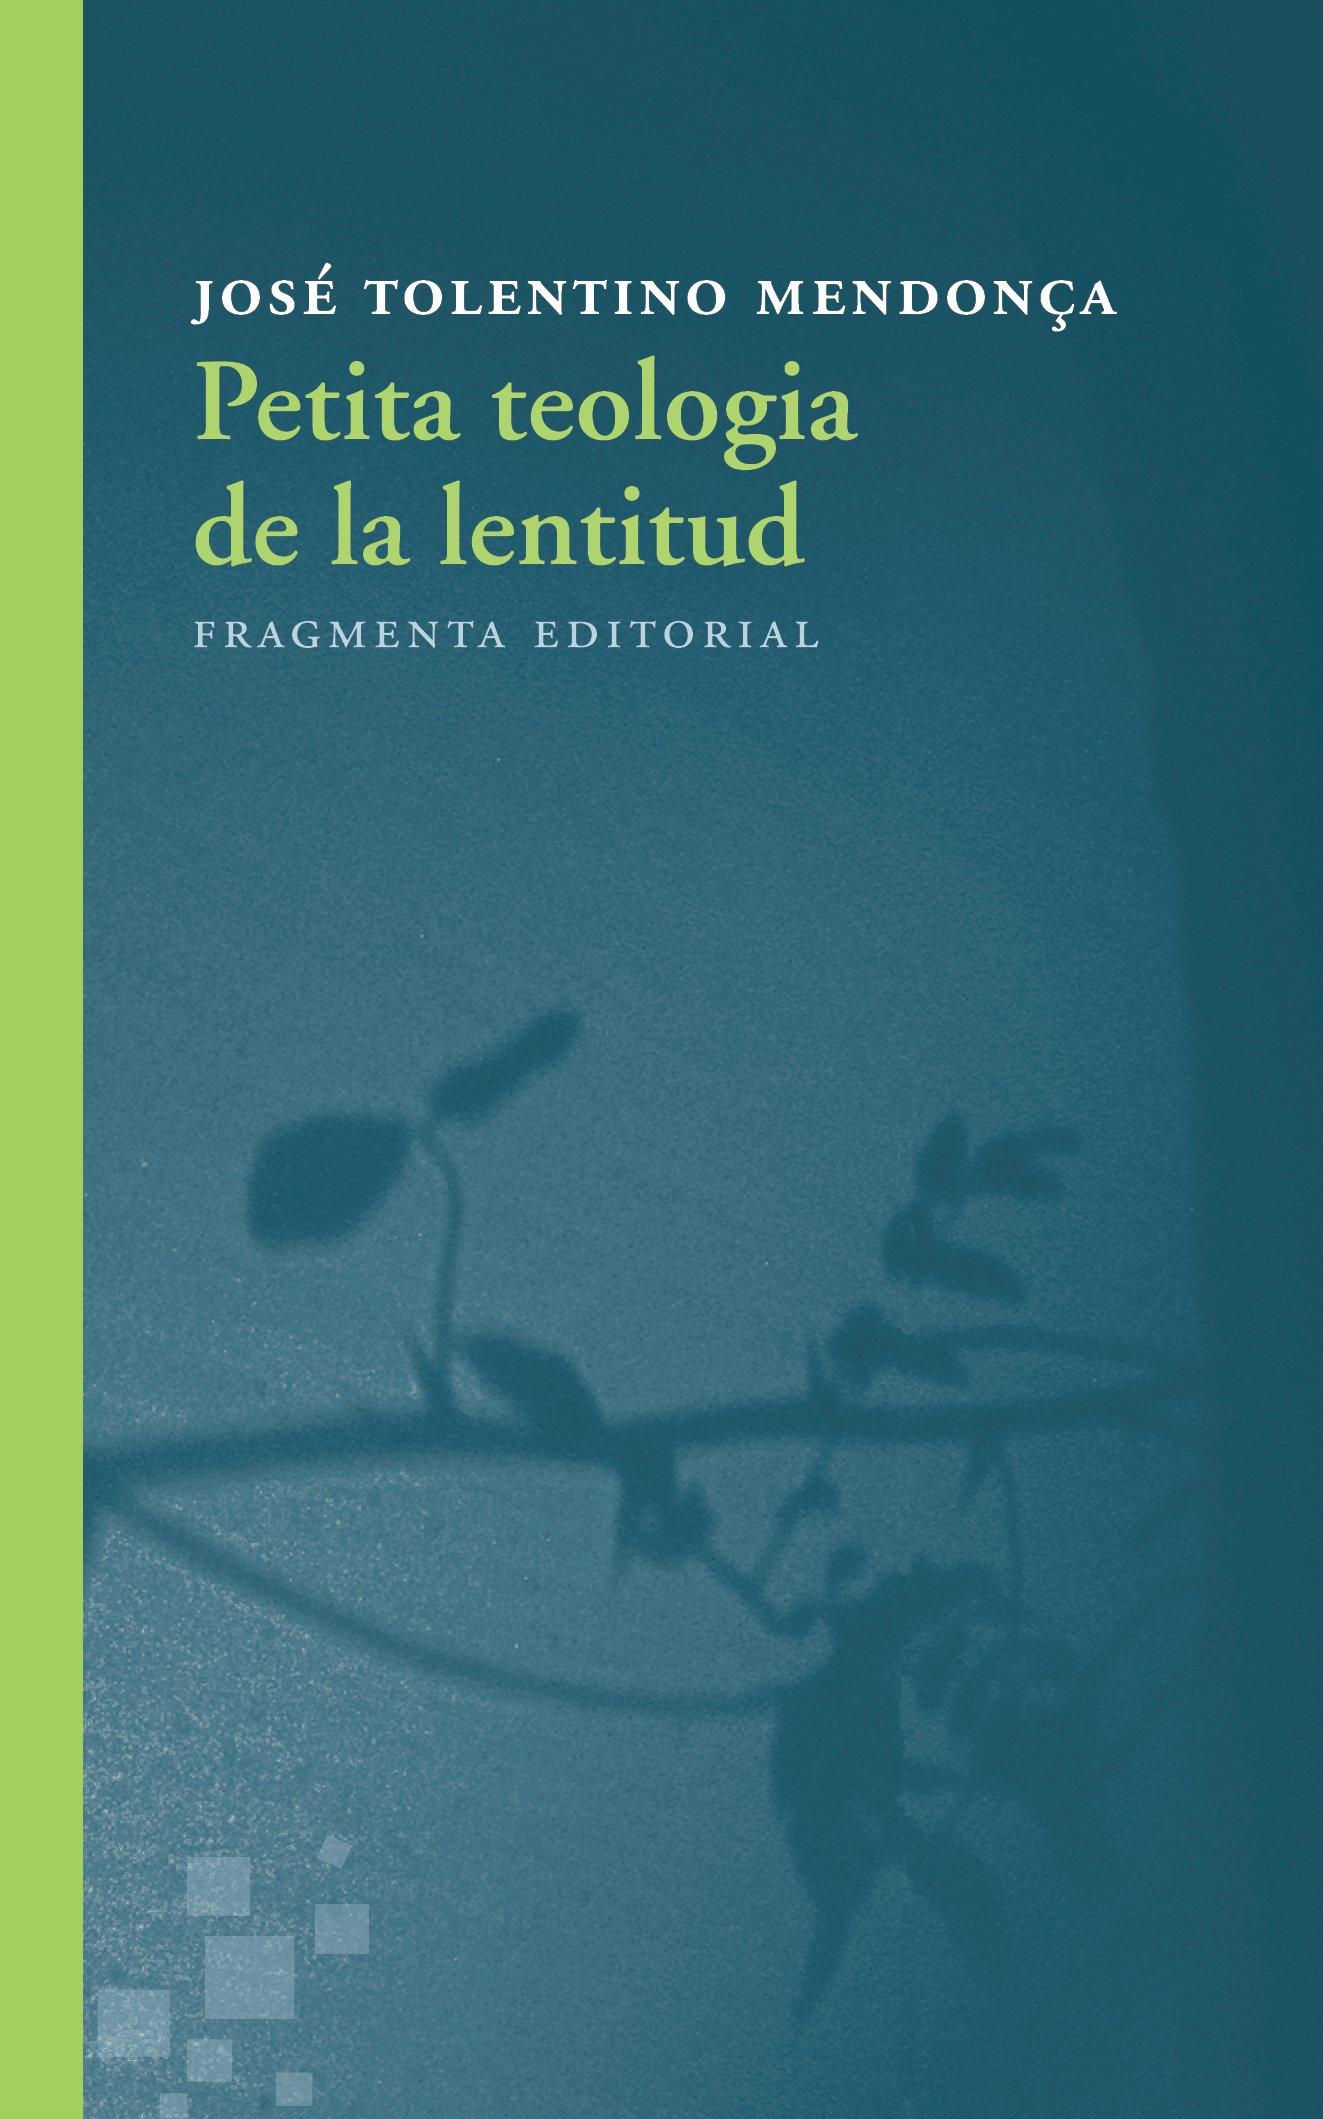 Petita teologia de la lentitud (Assaig) (Catalán) Tapa blanda – 31 may 2017 José Tolentino Mendonça Pere Comellas Casanova Fragmenta Editorial SL